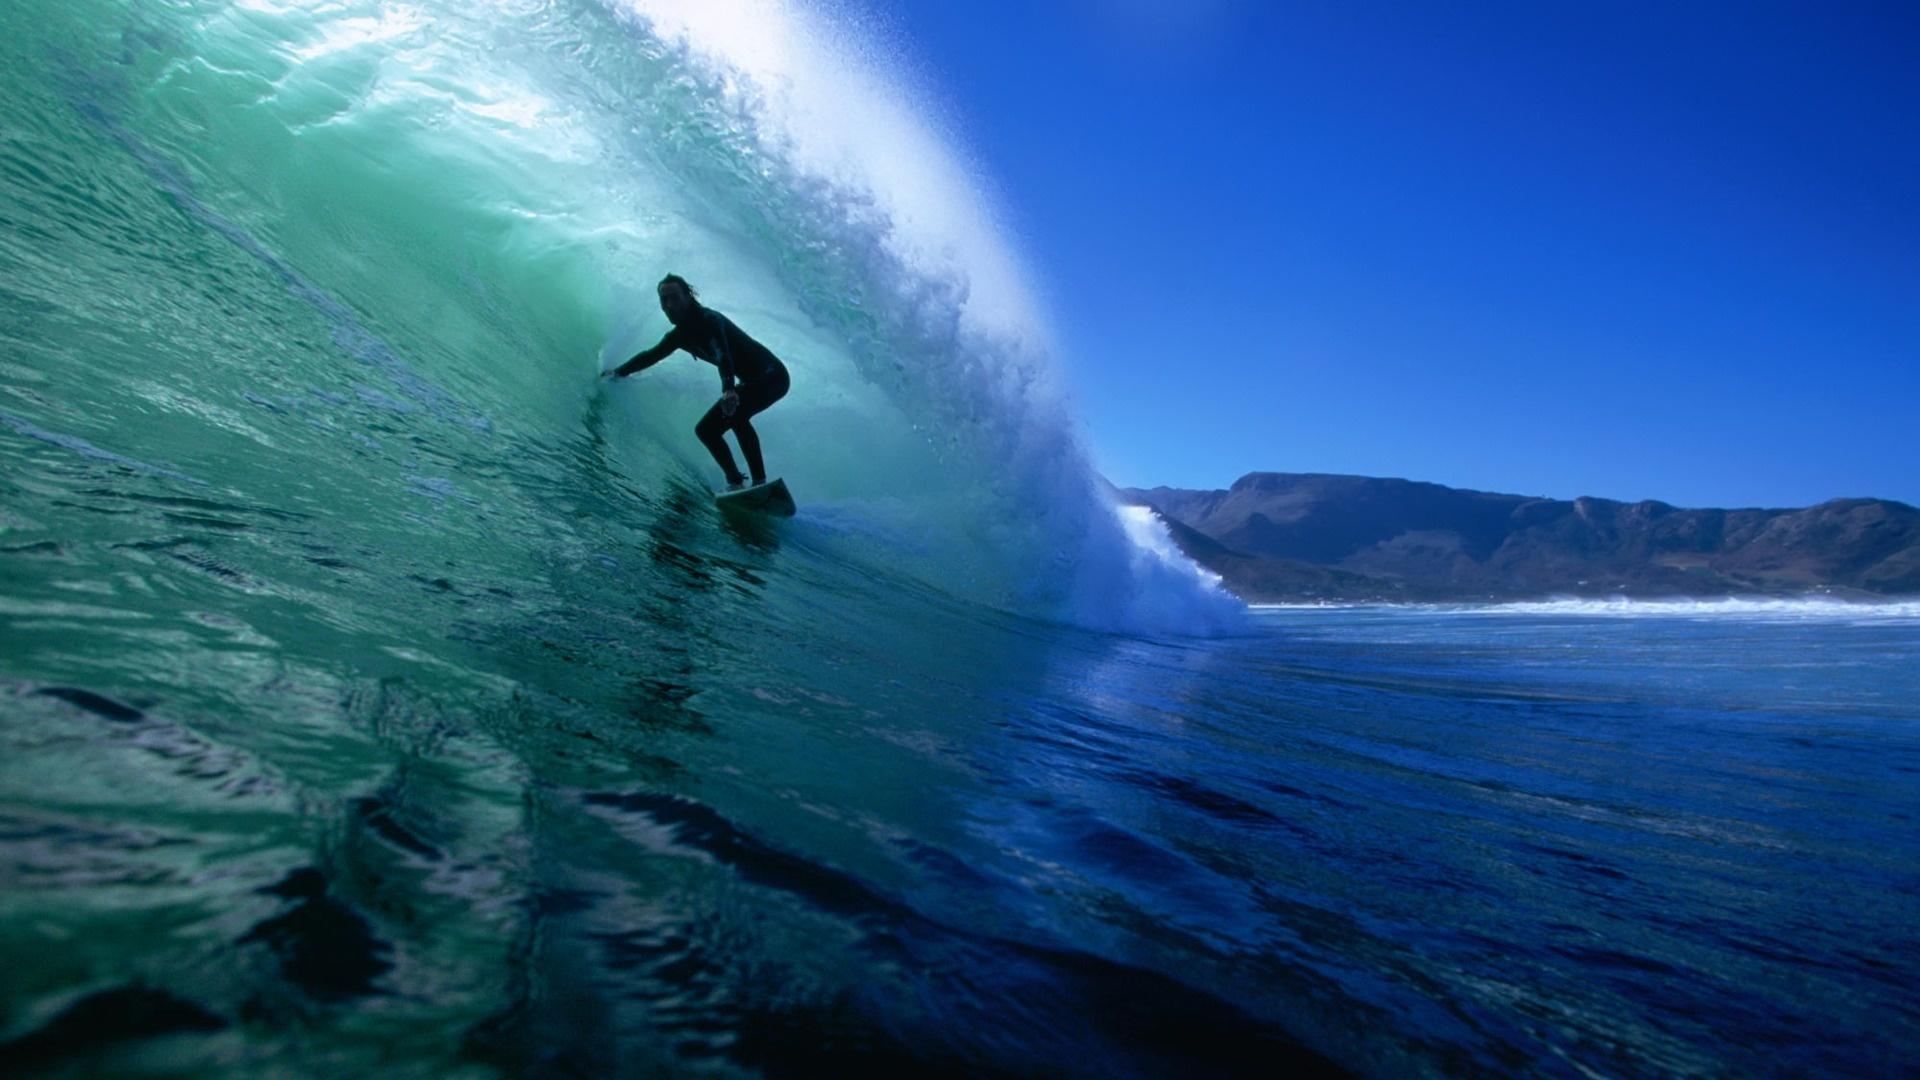 Surfing Wallpaper   Cool Desktop Background 1920x1080